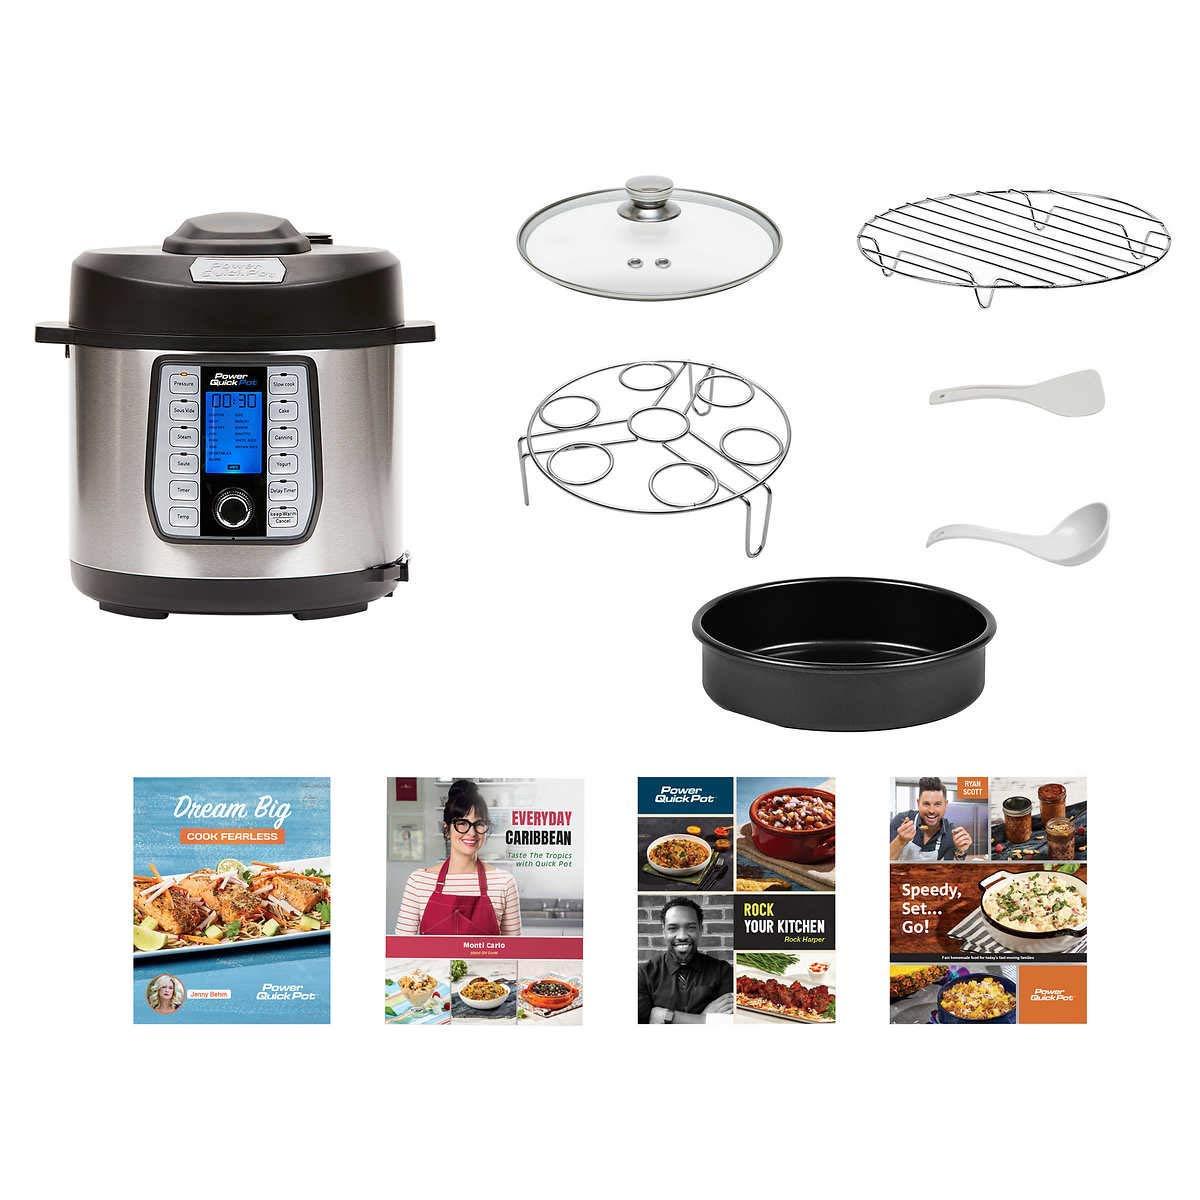 Power Quick Pot (6 QUART) 37 in1 Multi- Use Programmable Pressure Cooker, Slow Cooker, Rice Cooker, Yogurt Maker, Cake Maker, Egg Cooker, Baking, ...